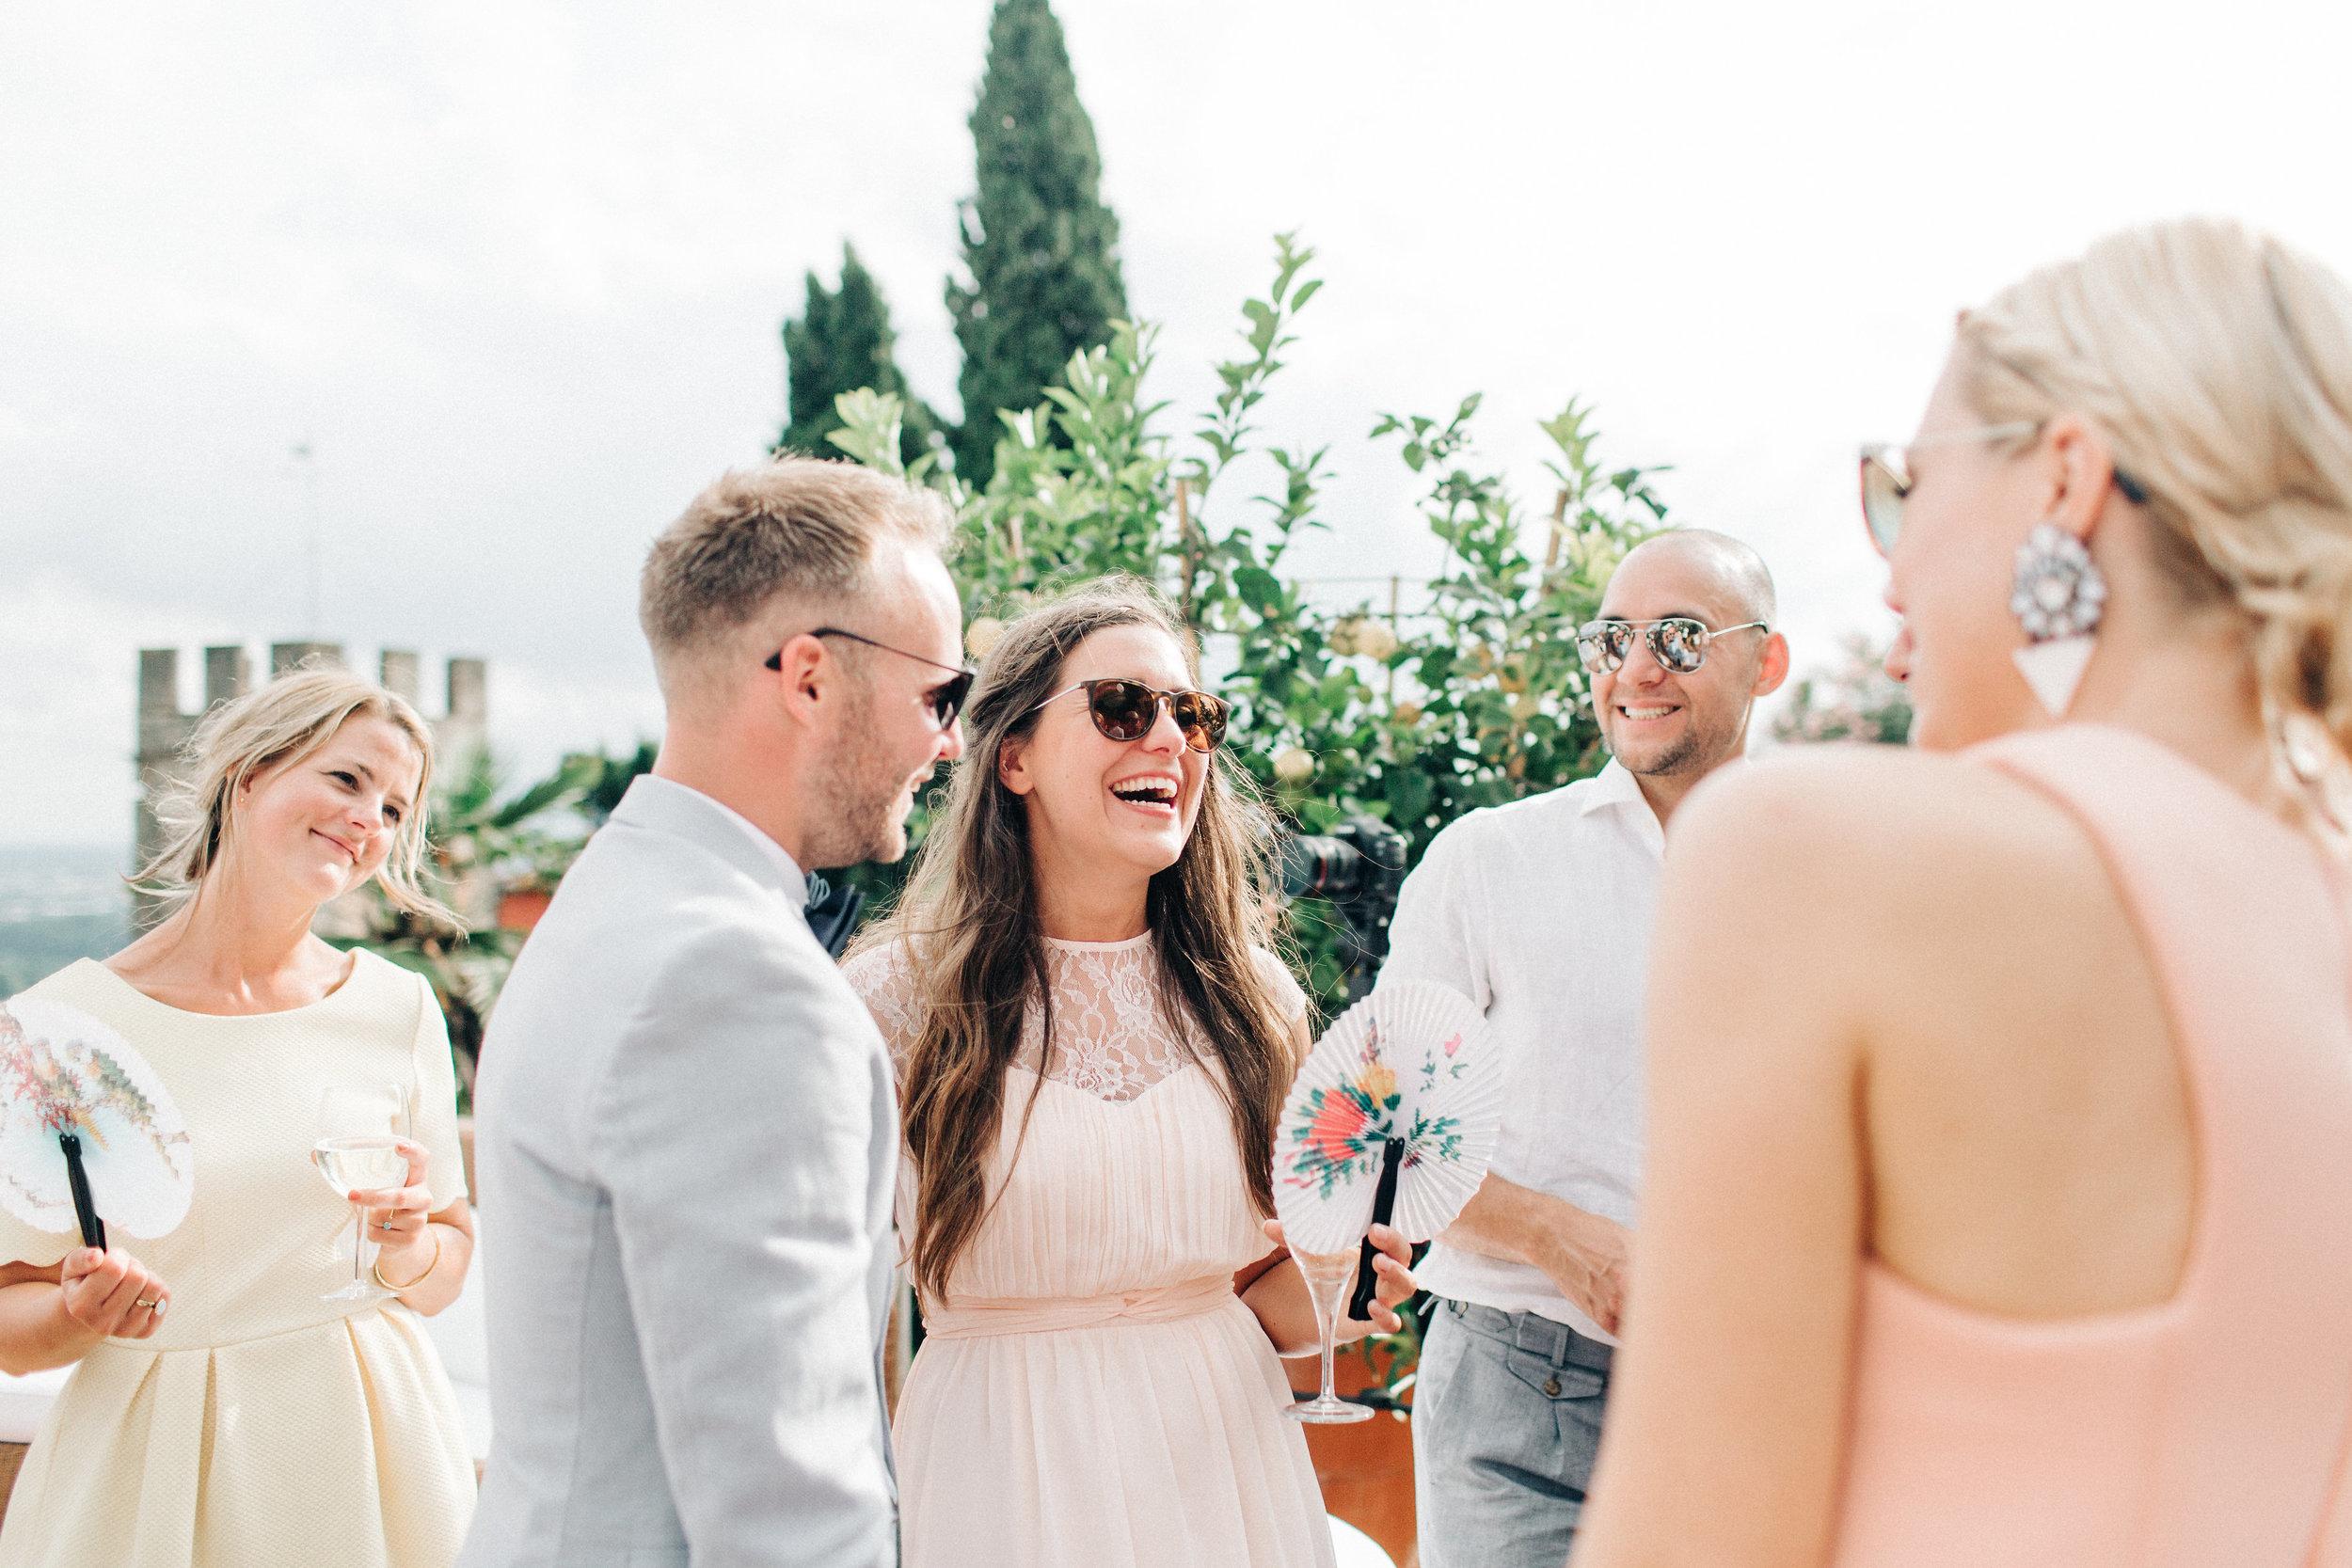 Amanda-Drost-Photography-wedding-Arjan+Emmy-279.jpg